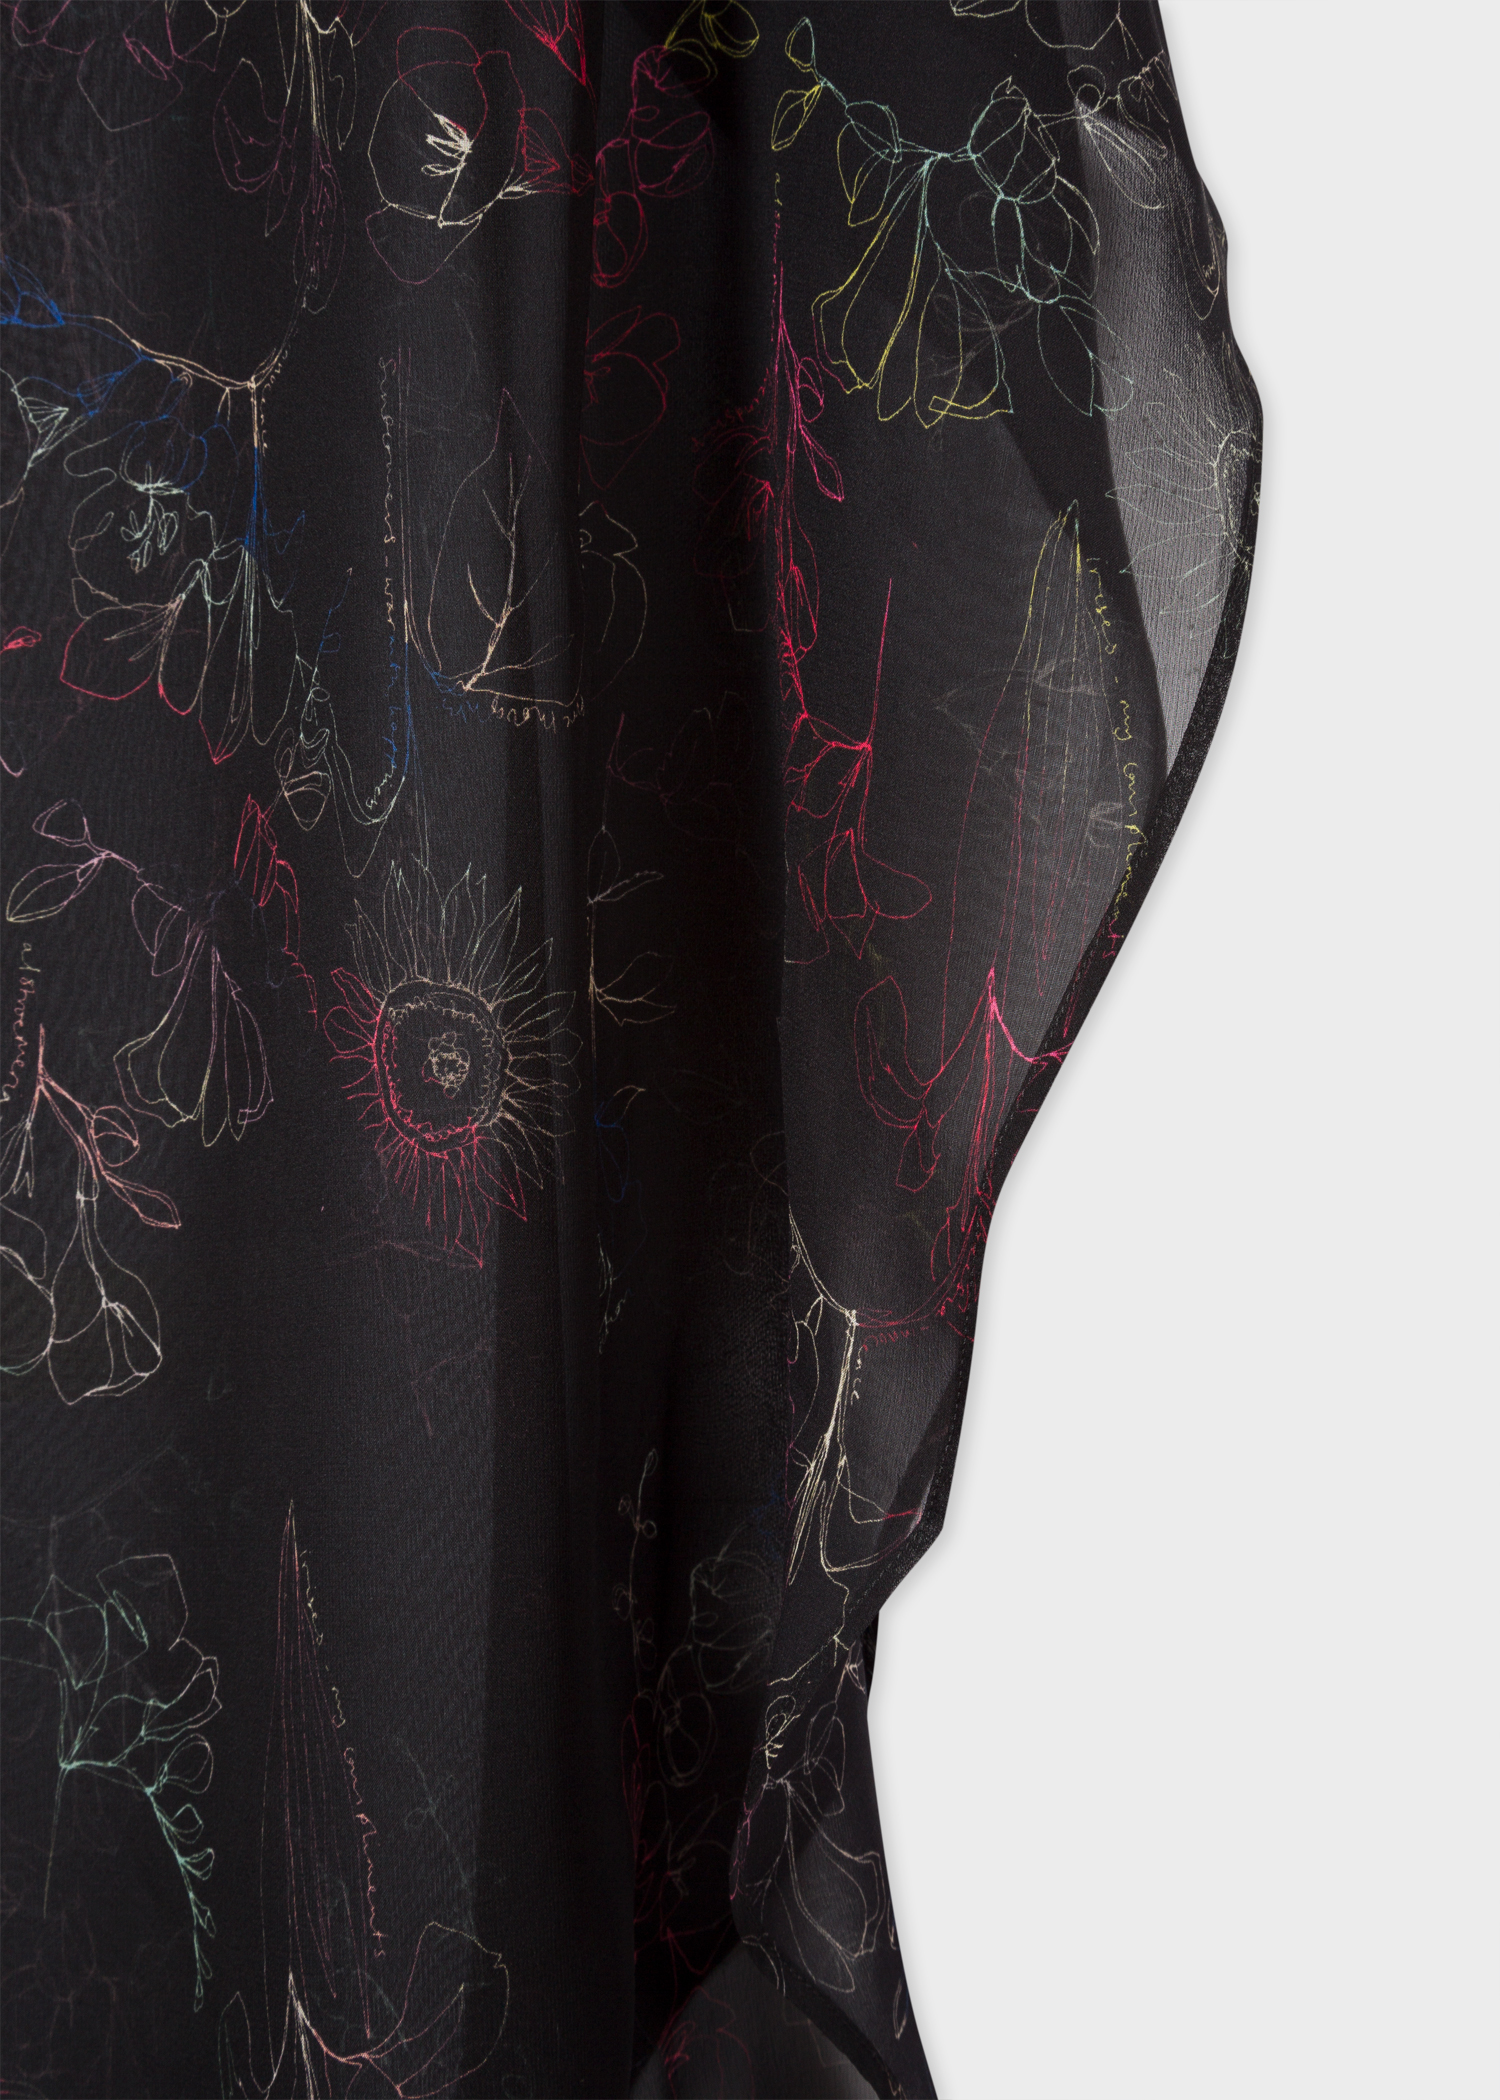 fba0a3fb0fe Print view - Women s Sheer  Swirl Floral  Print Silk Tunic ...